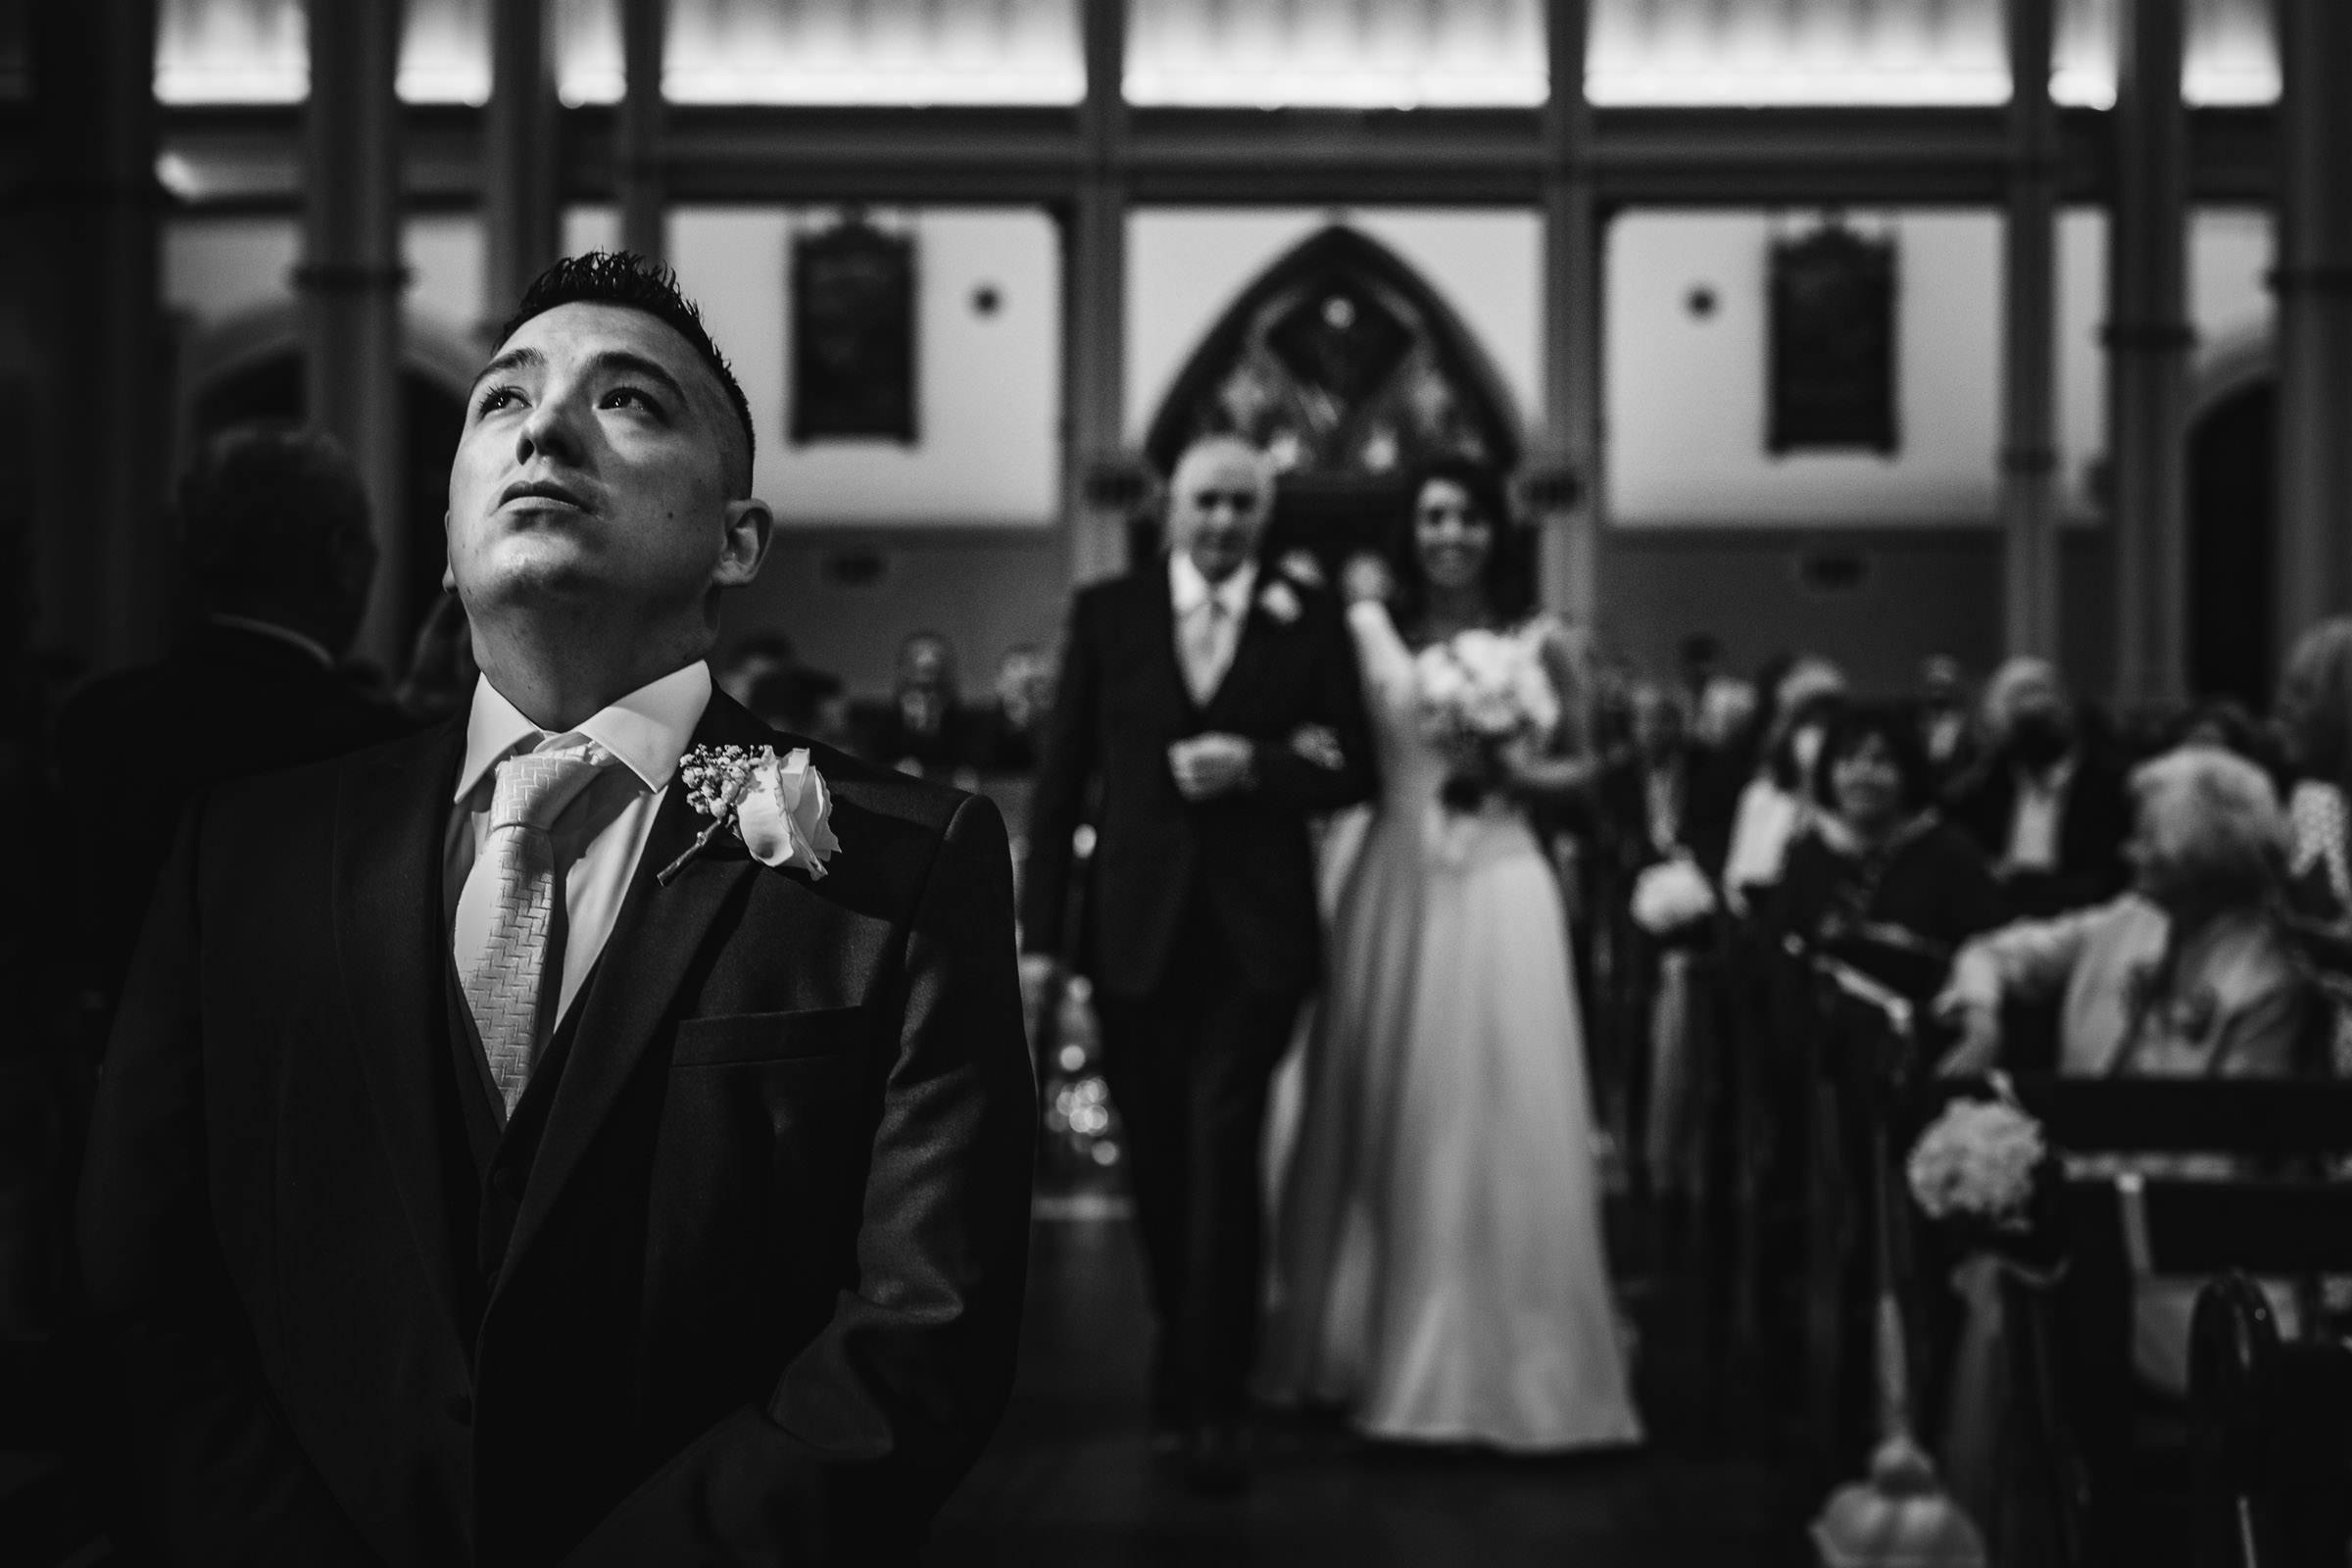 groom-awaits-bride-as-father-walks-bride-to-altar-lima-conlon-photography